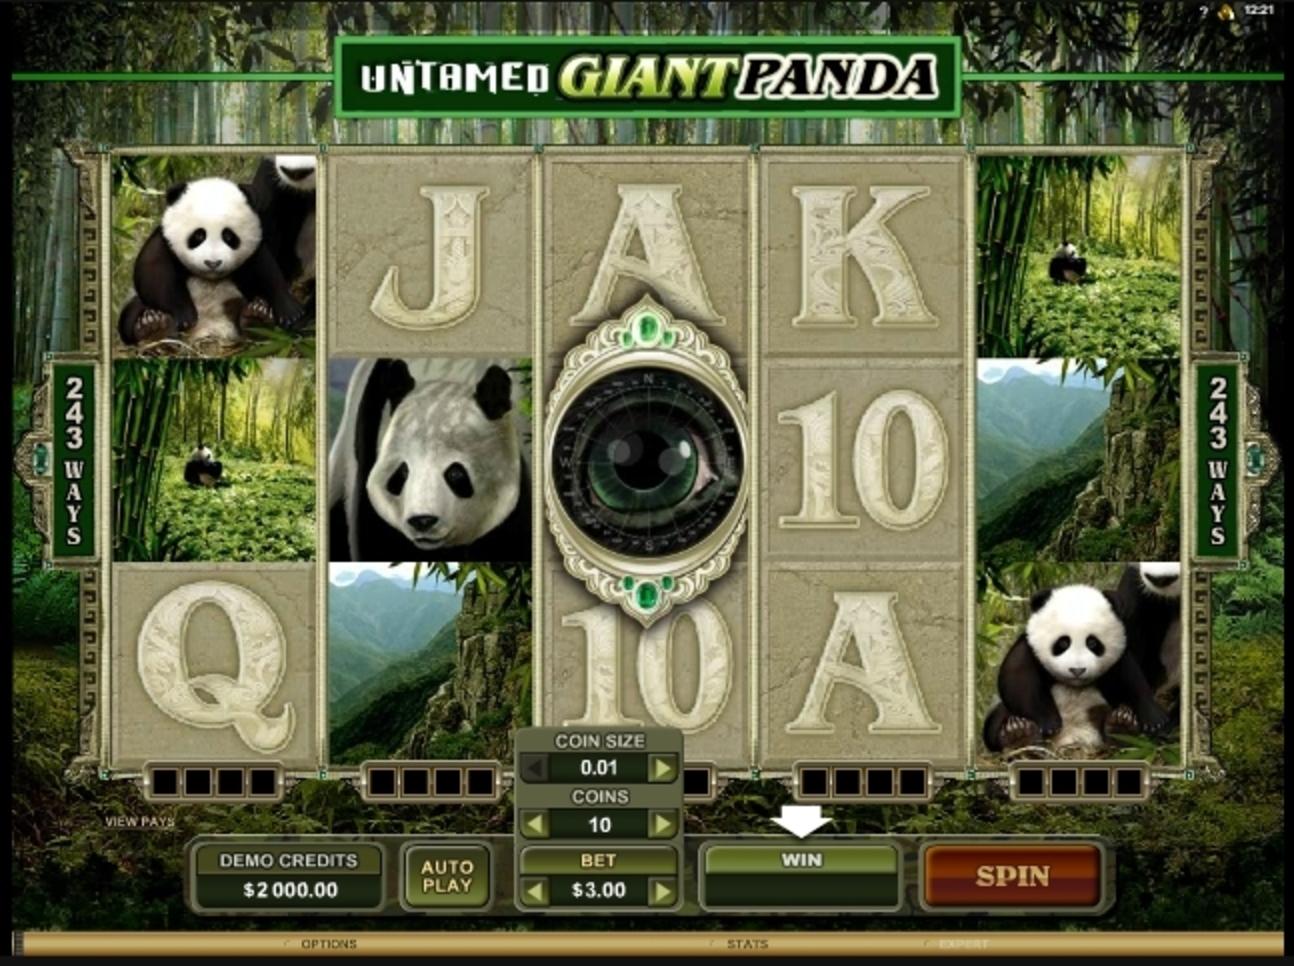 Legends Of Africa Mobile Slot Machine